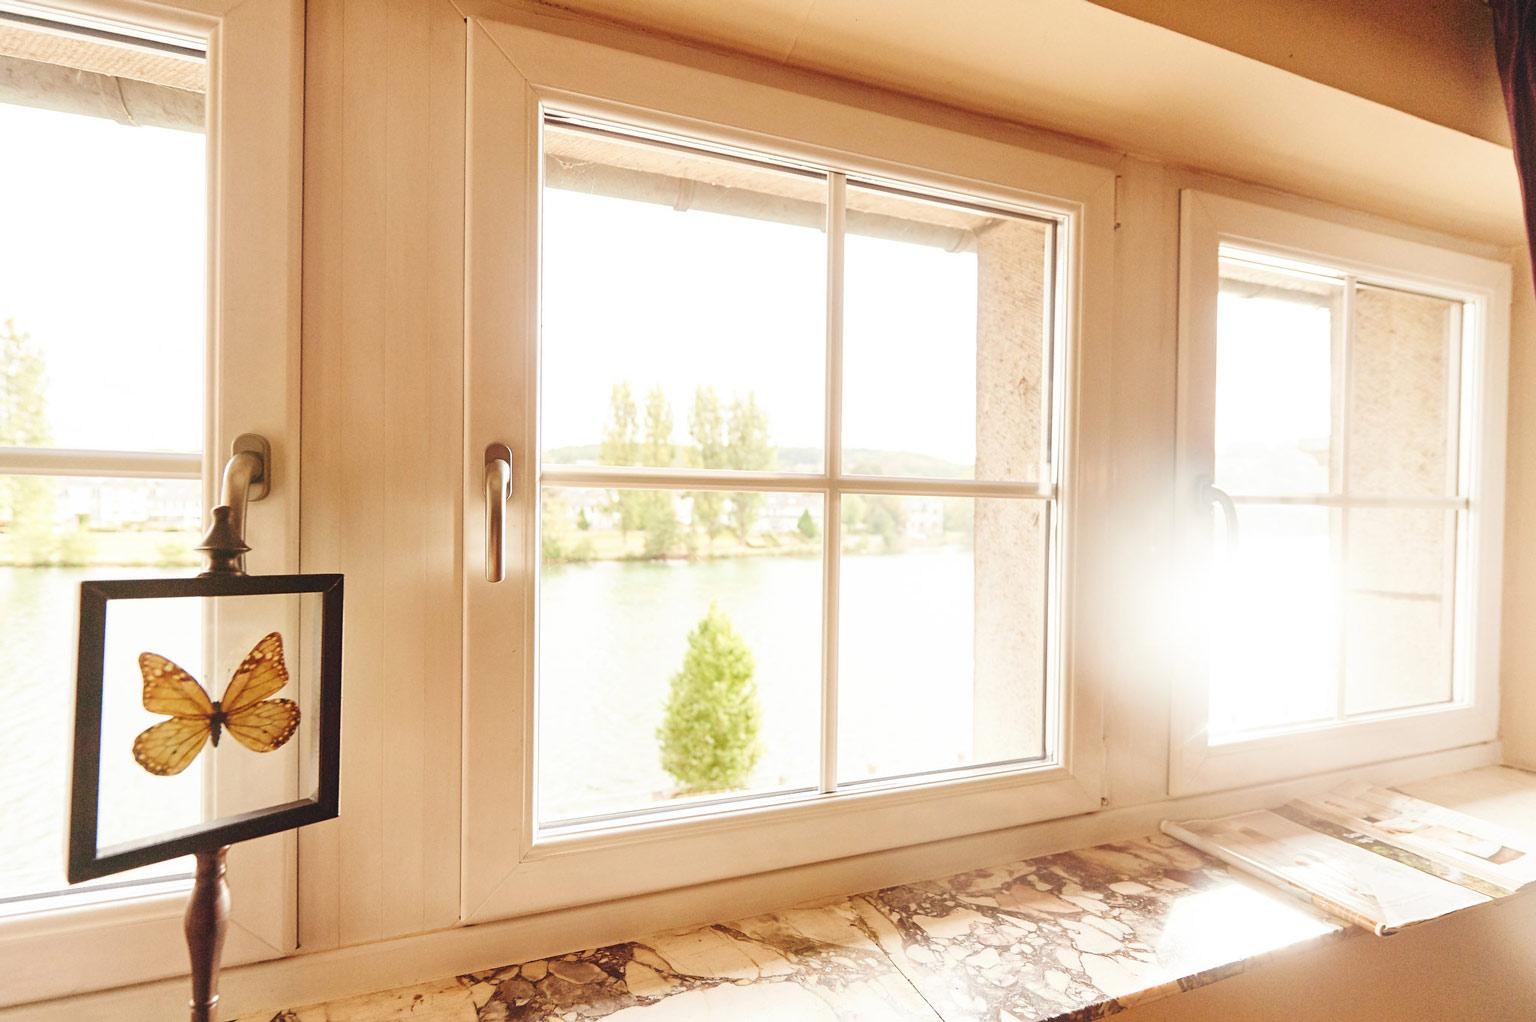 Fenêtres en PVC blanc